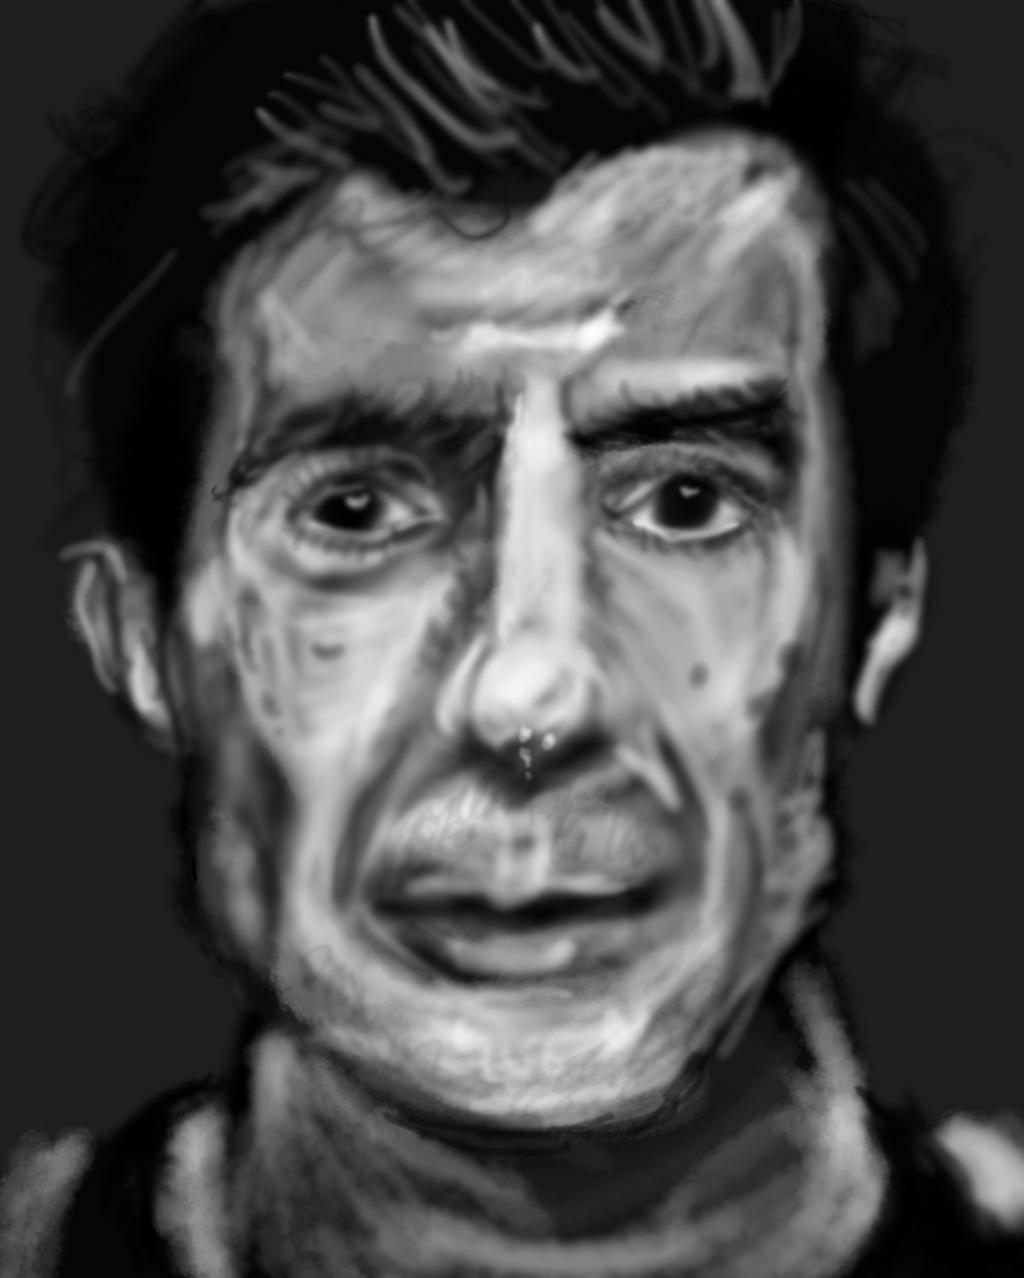 Luis portrait by PE-robukka